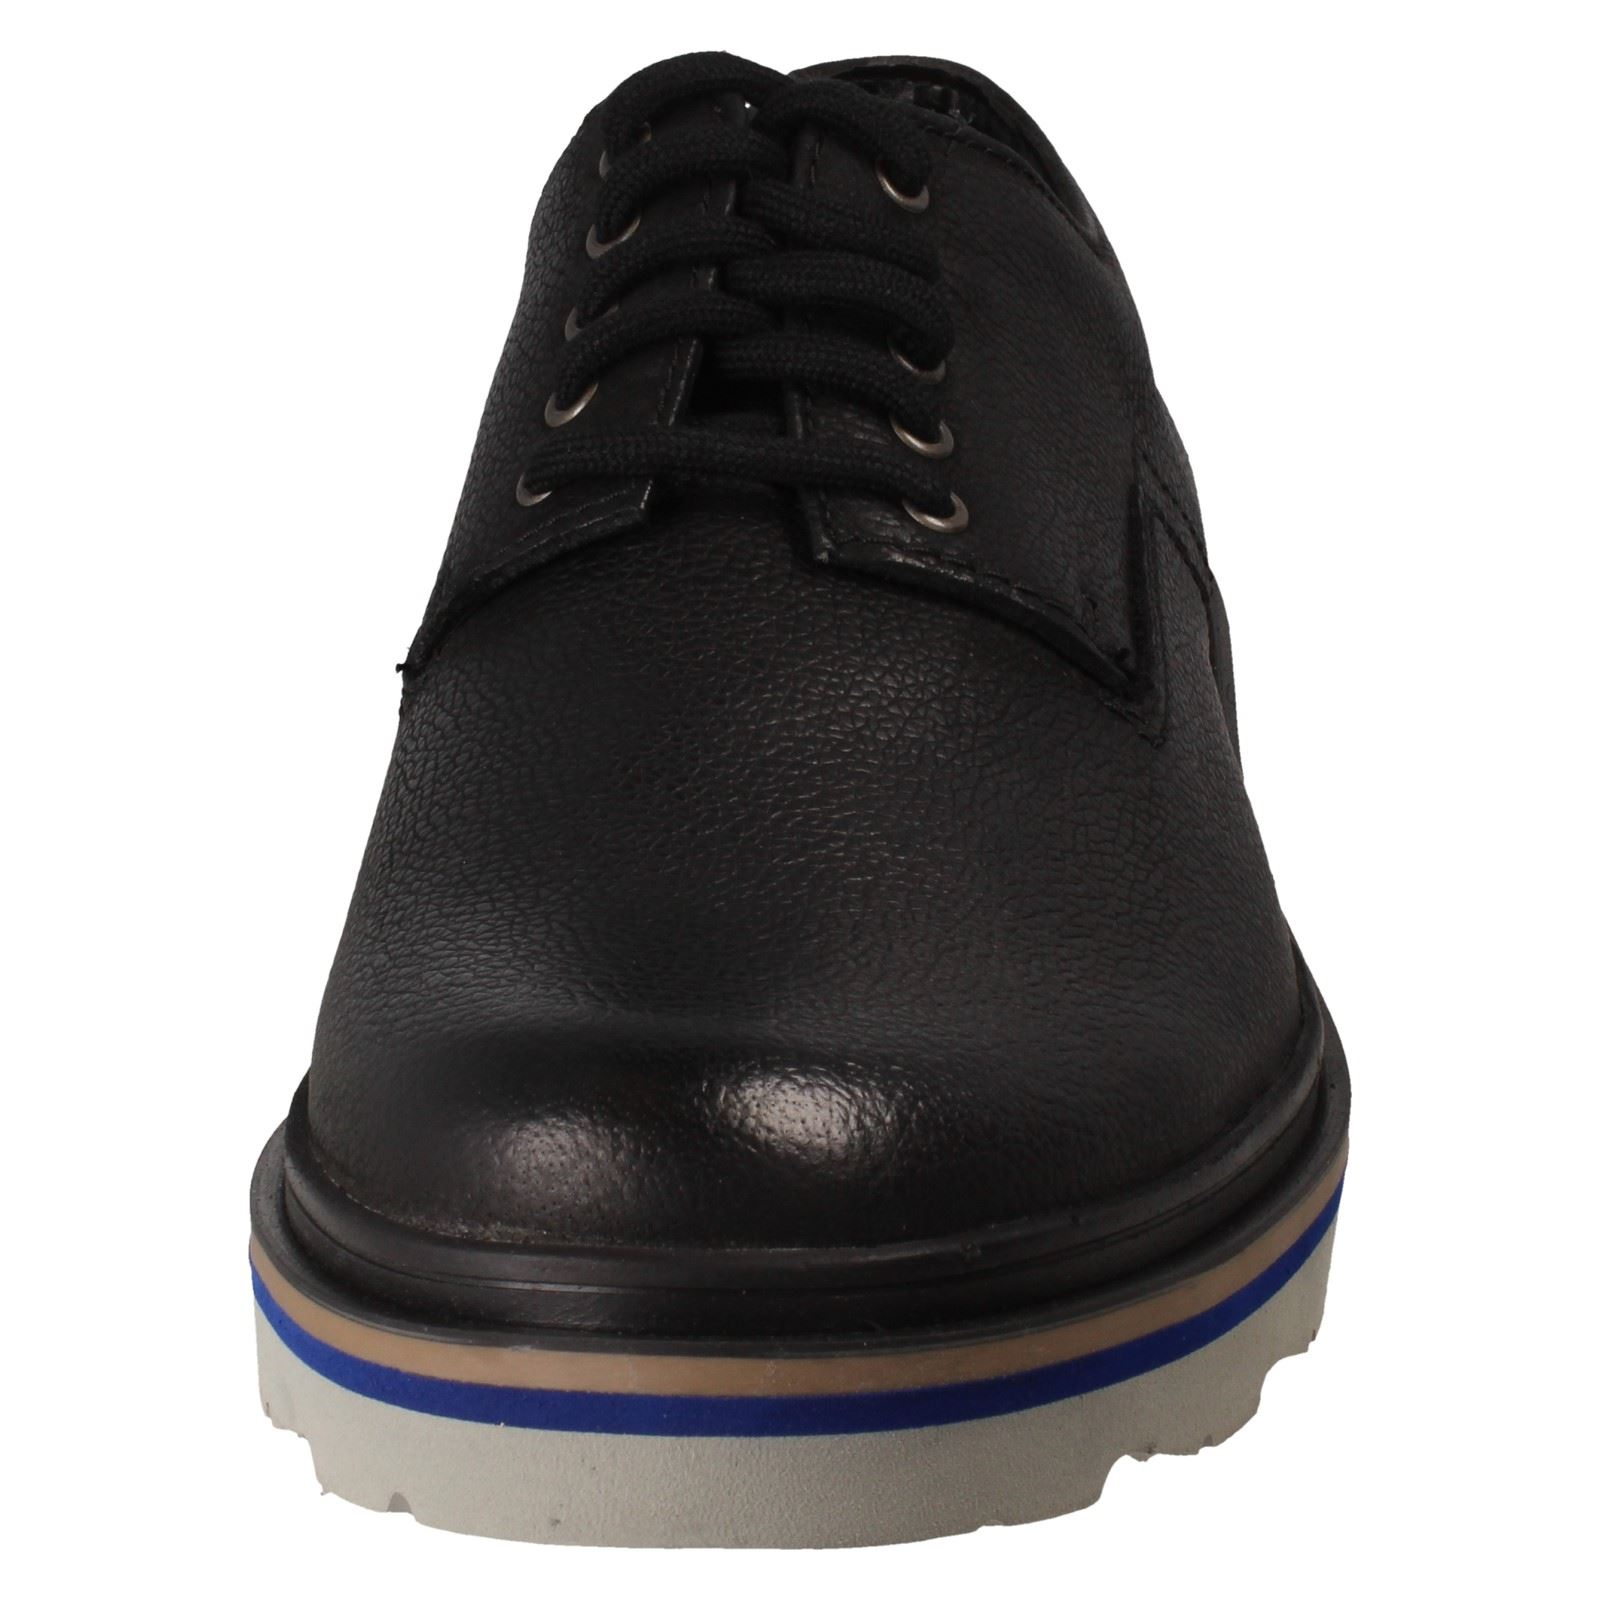 Mens Clarks Casual Shoes /'/'Frelan Edge/'/'